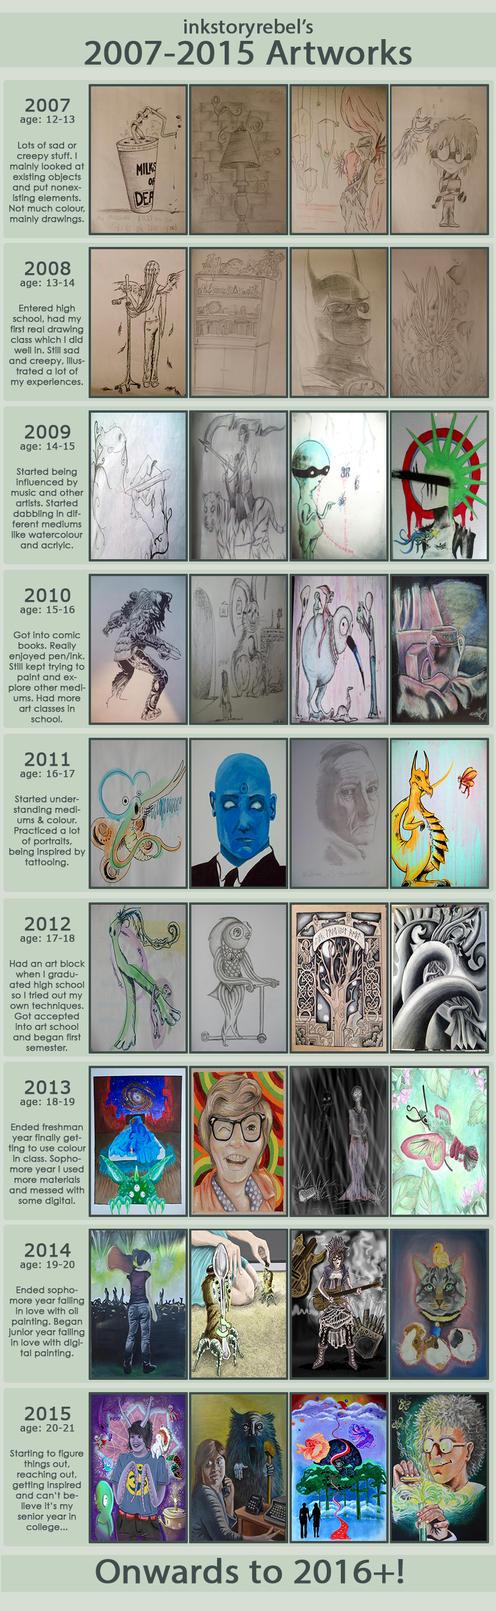 Inkstoryrebel's Art 2007-2015 by inkstoryrebel